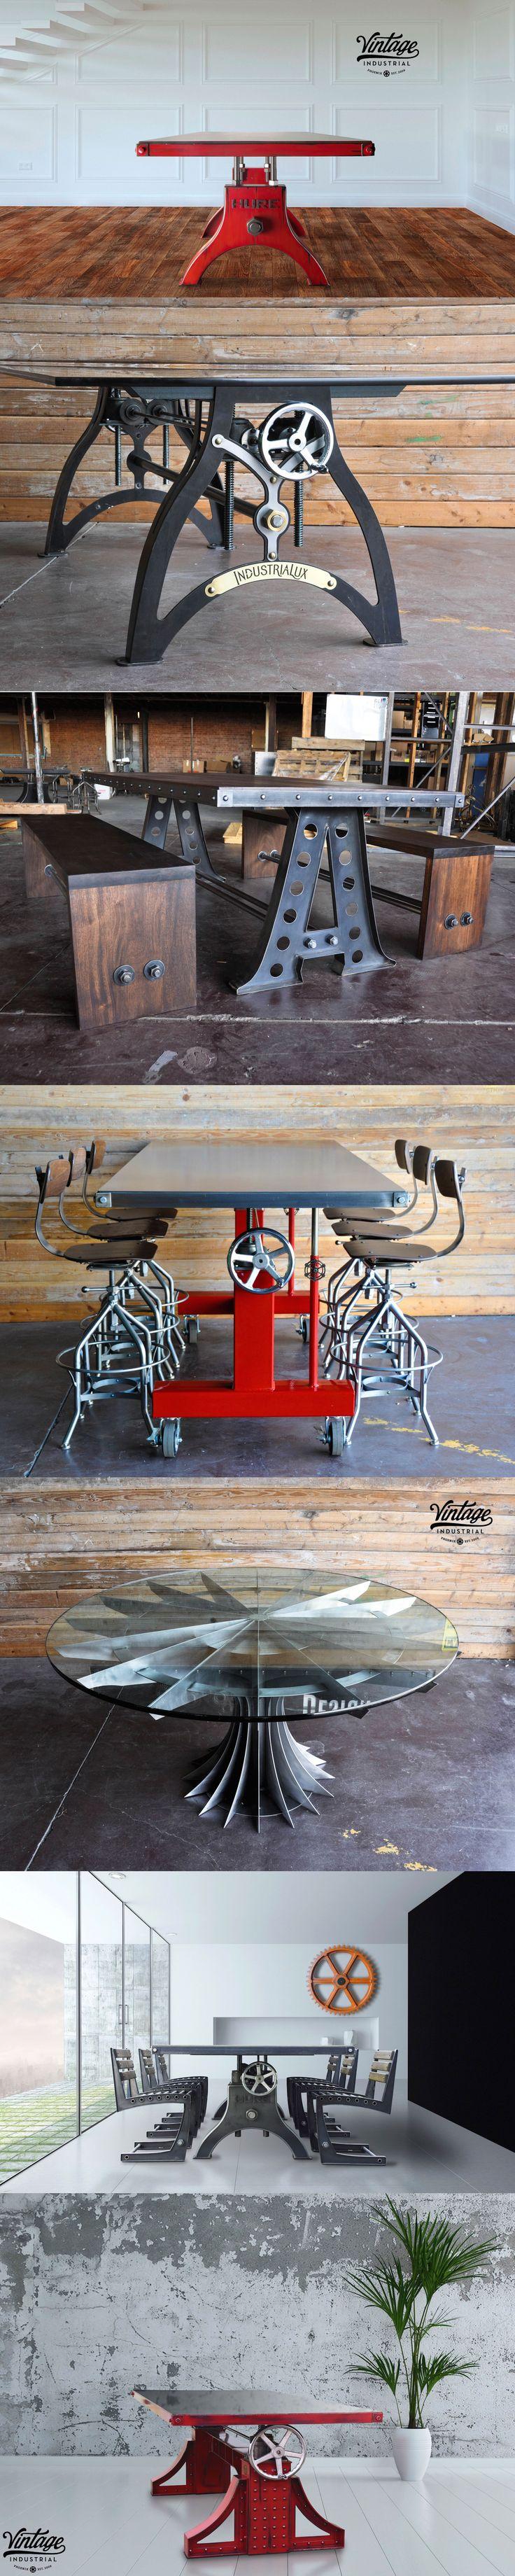 Oa oak dining room table phoenix - Digital Hure Industrial Dining Tablesvintage